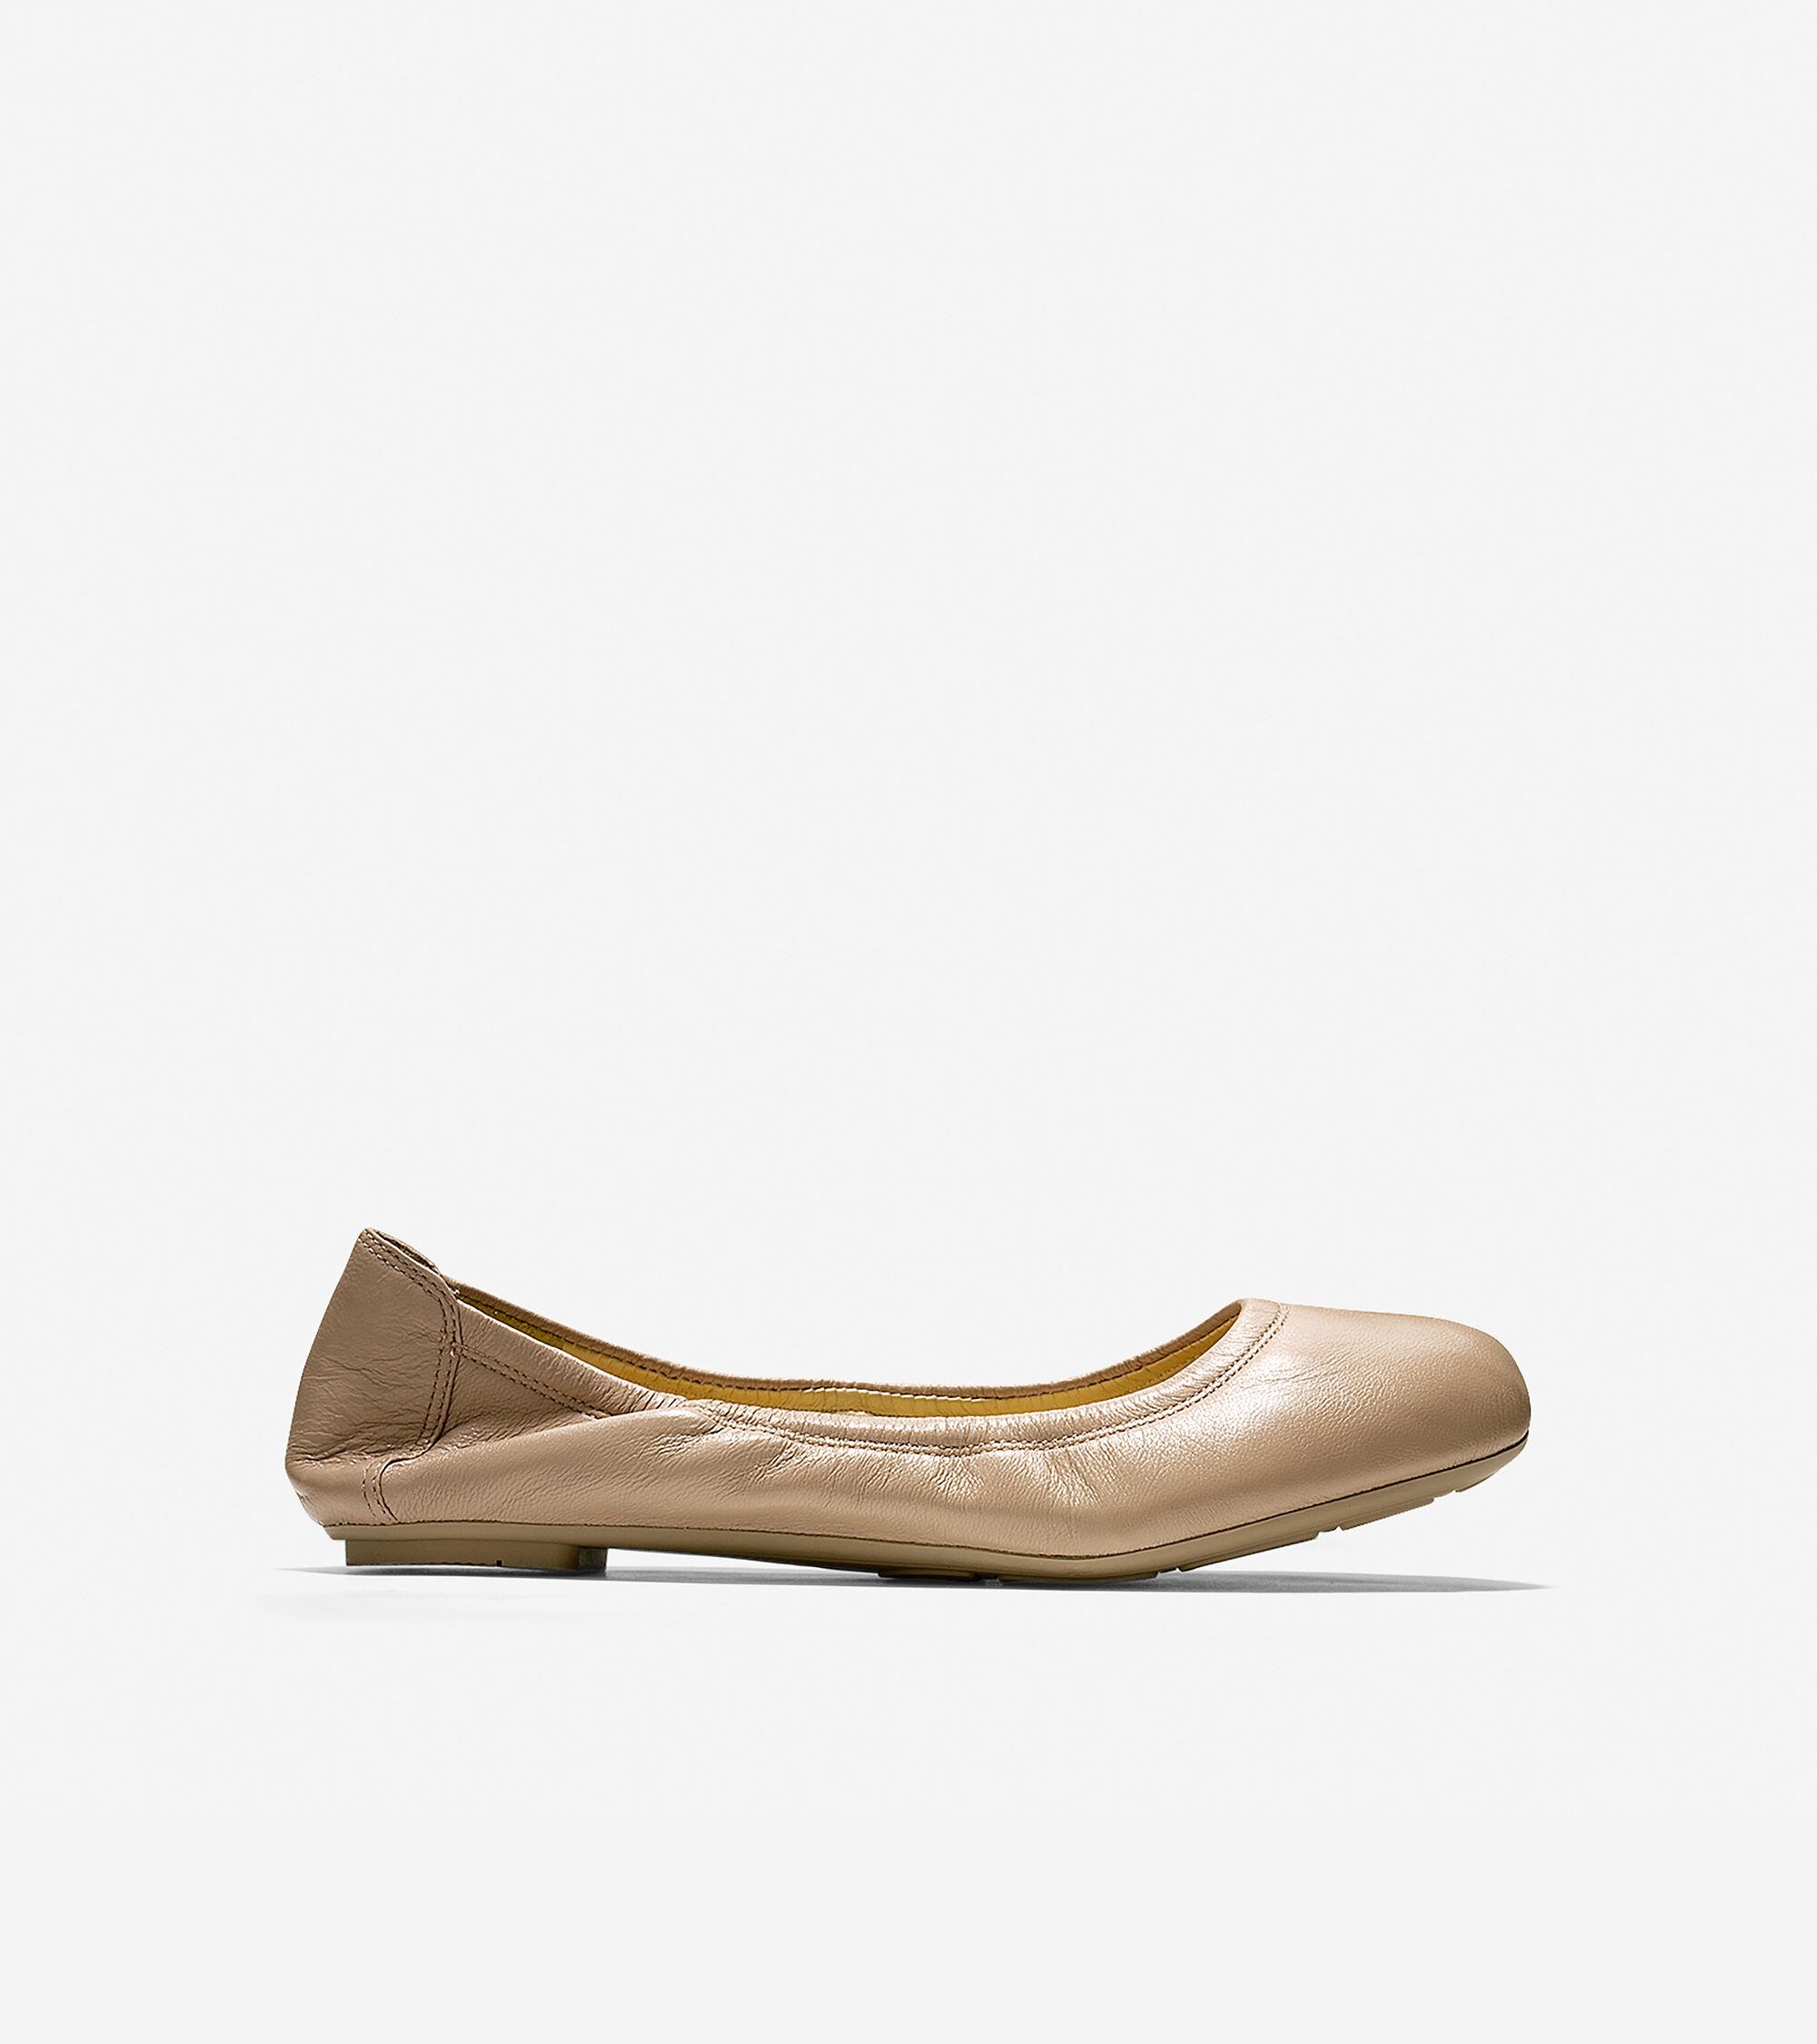 Ballet Flats in Sandstone Leather